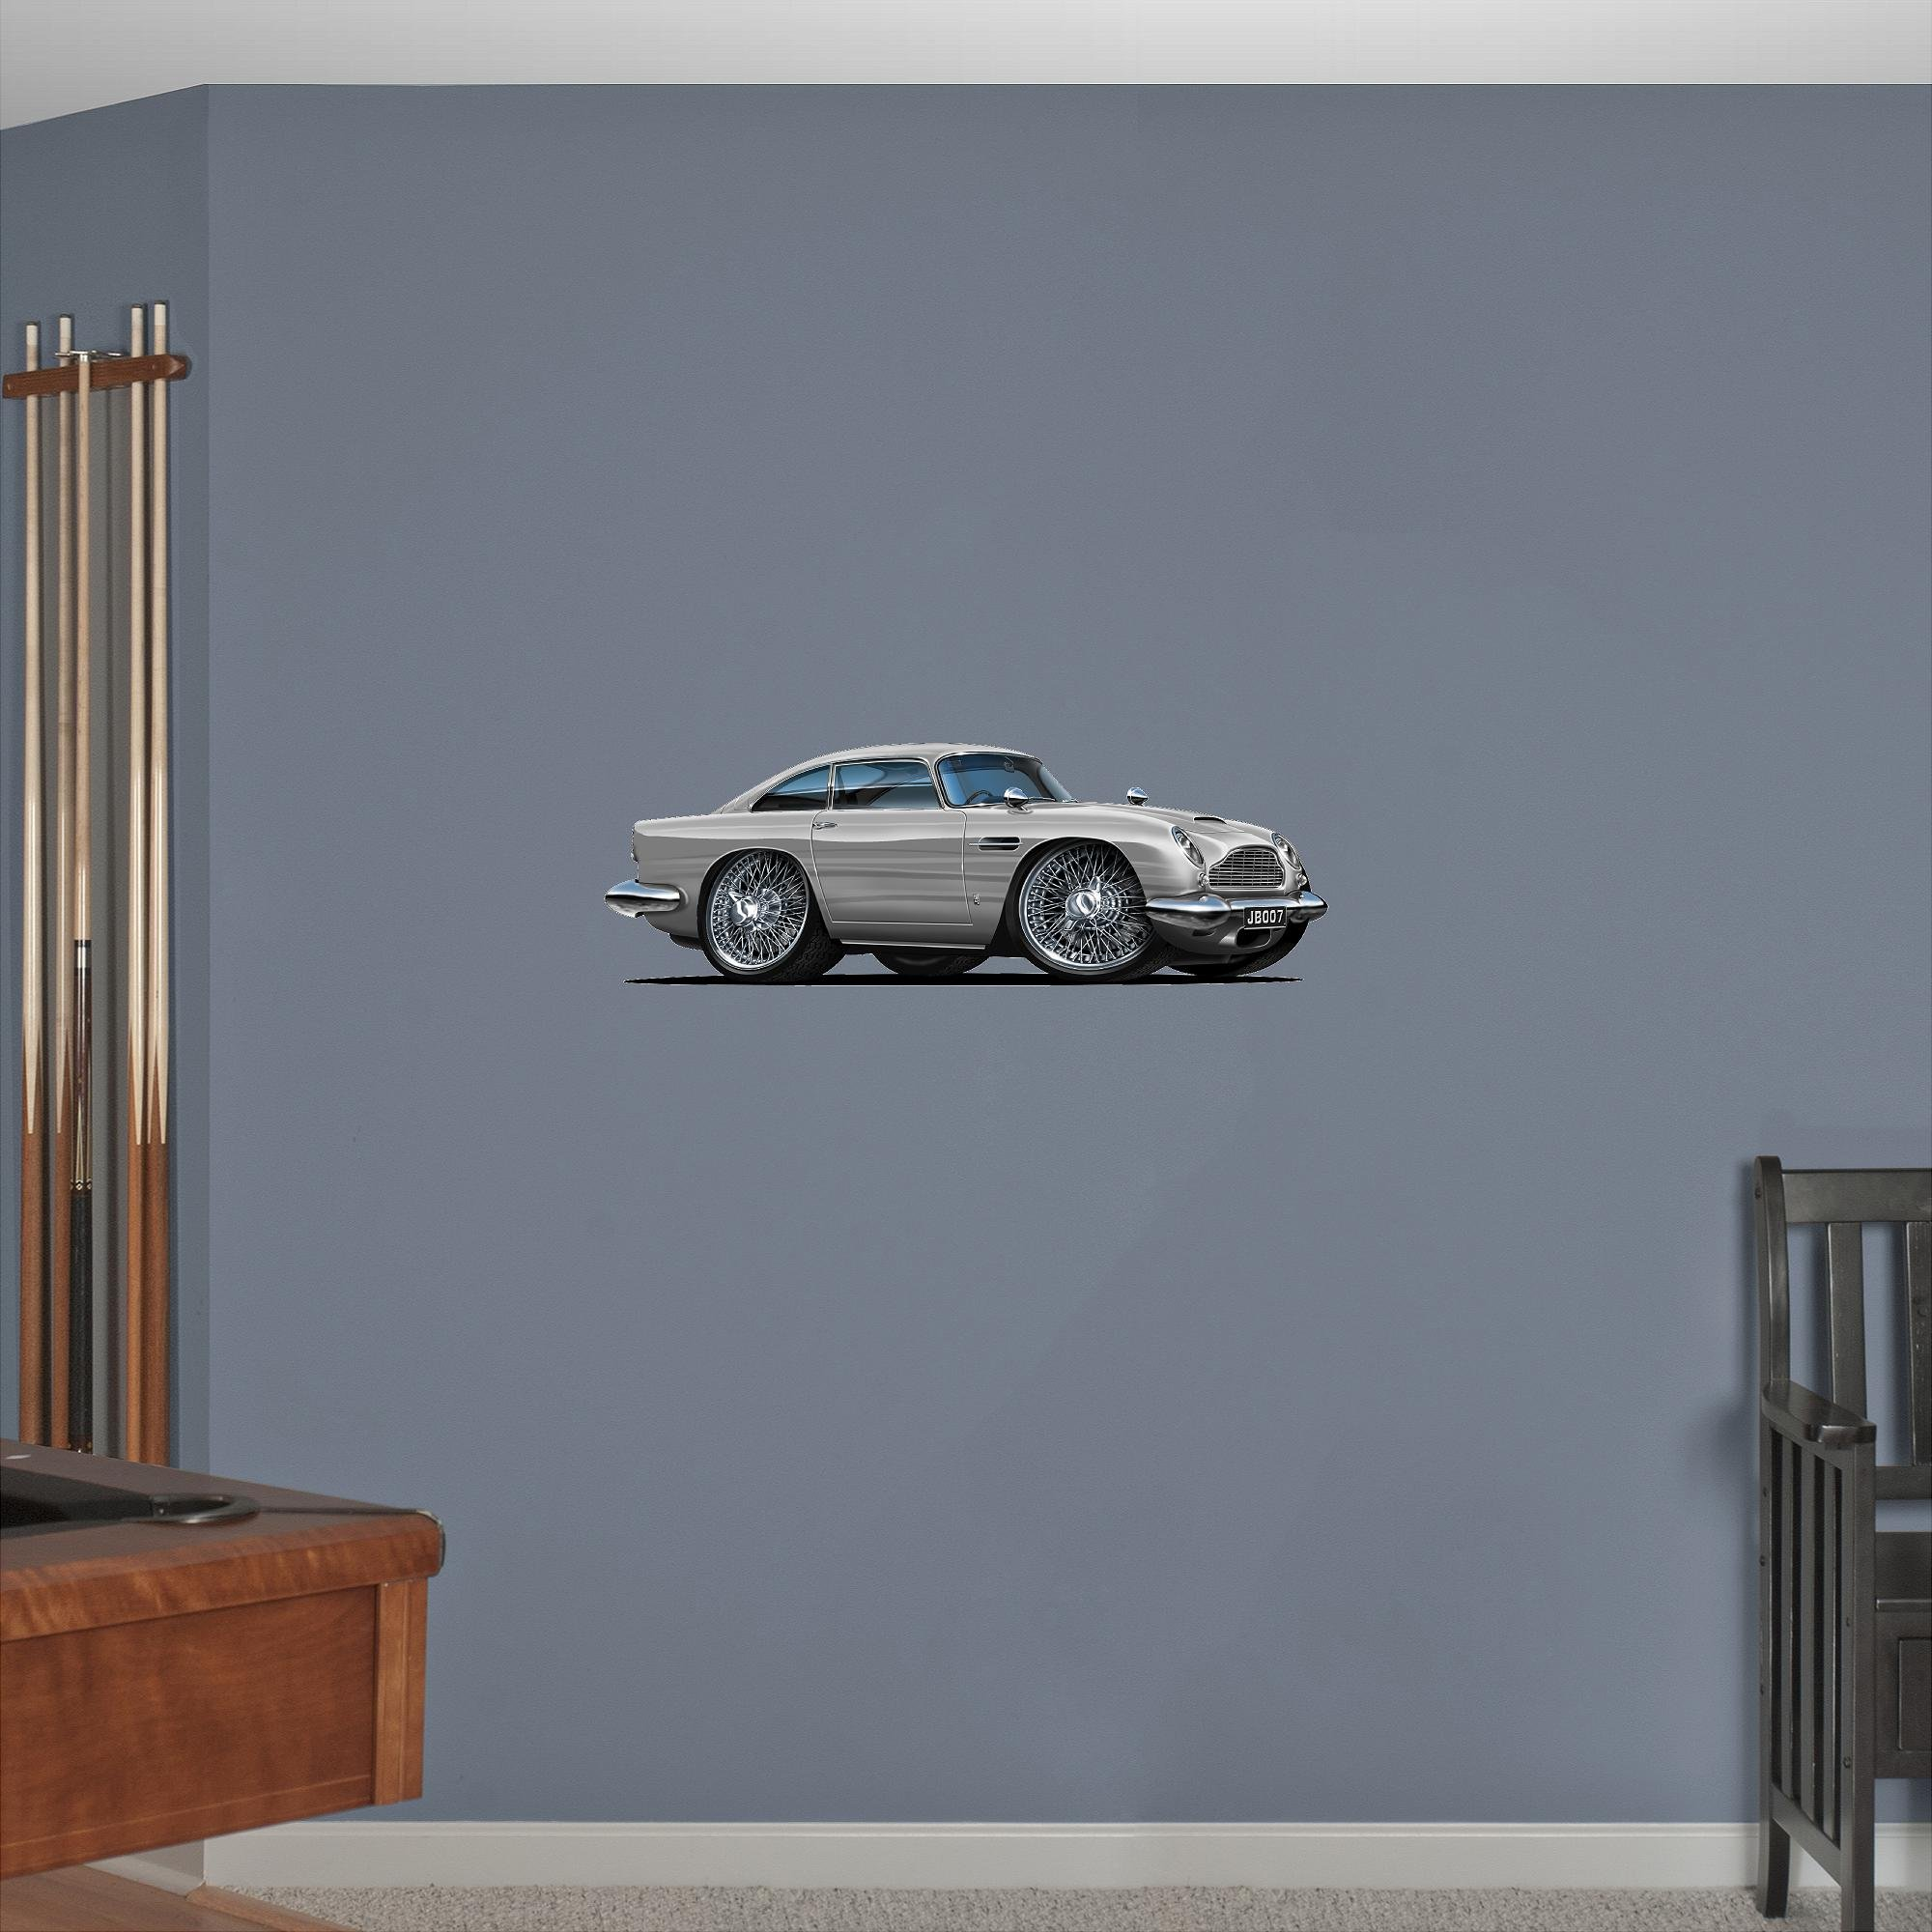 24'' Aston Martin Db5 Silver WALL DECAL Cartoon Luxury Car 3D Sticker Mural Kids Room Sports Den Man Cave Boys